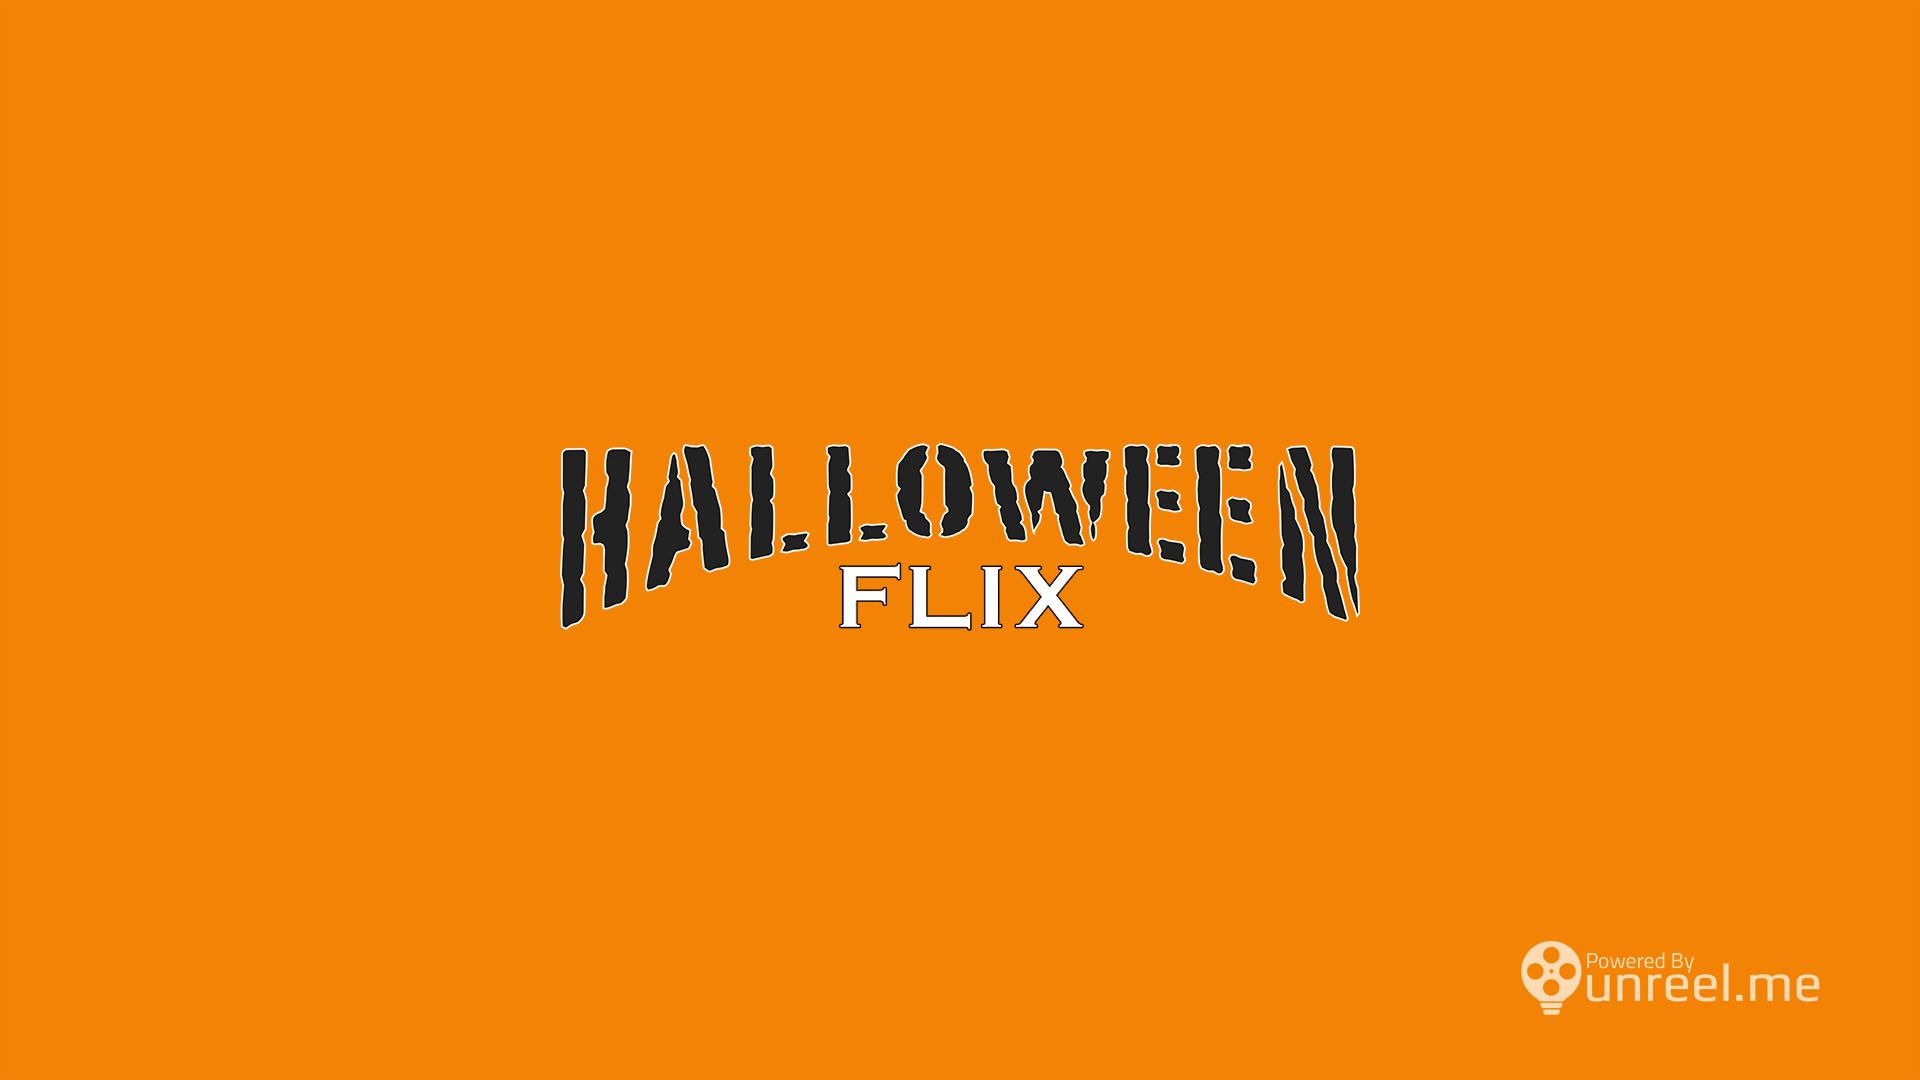 Buy family friendly halloween movies